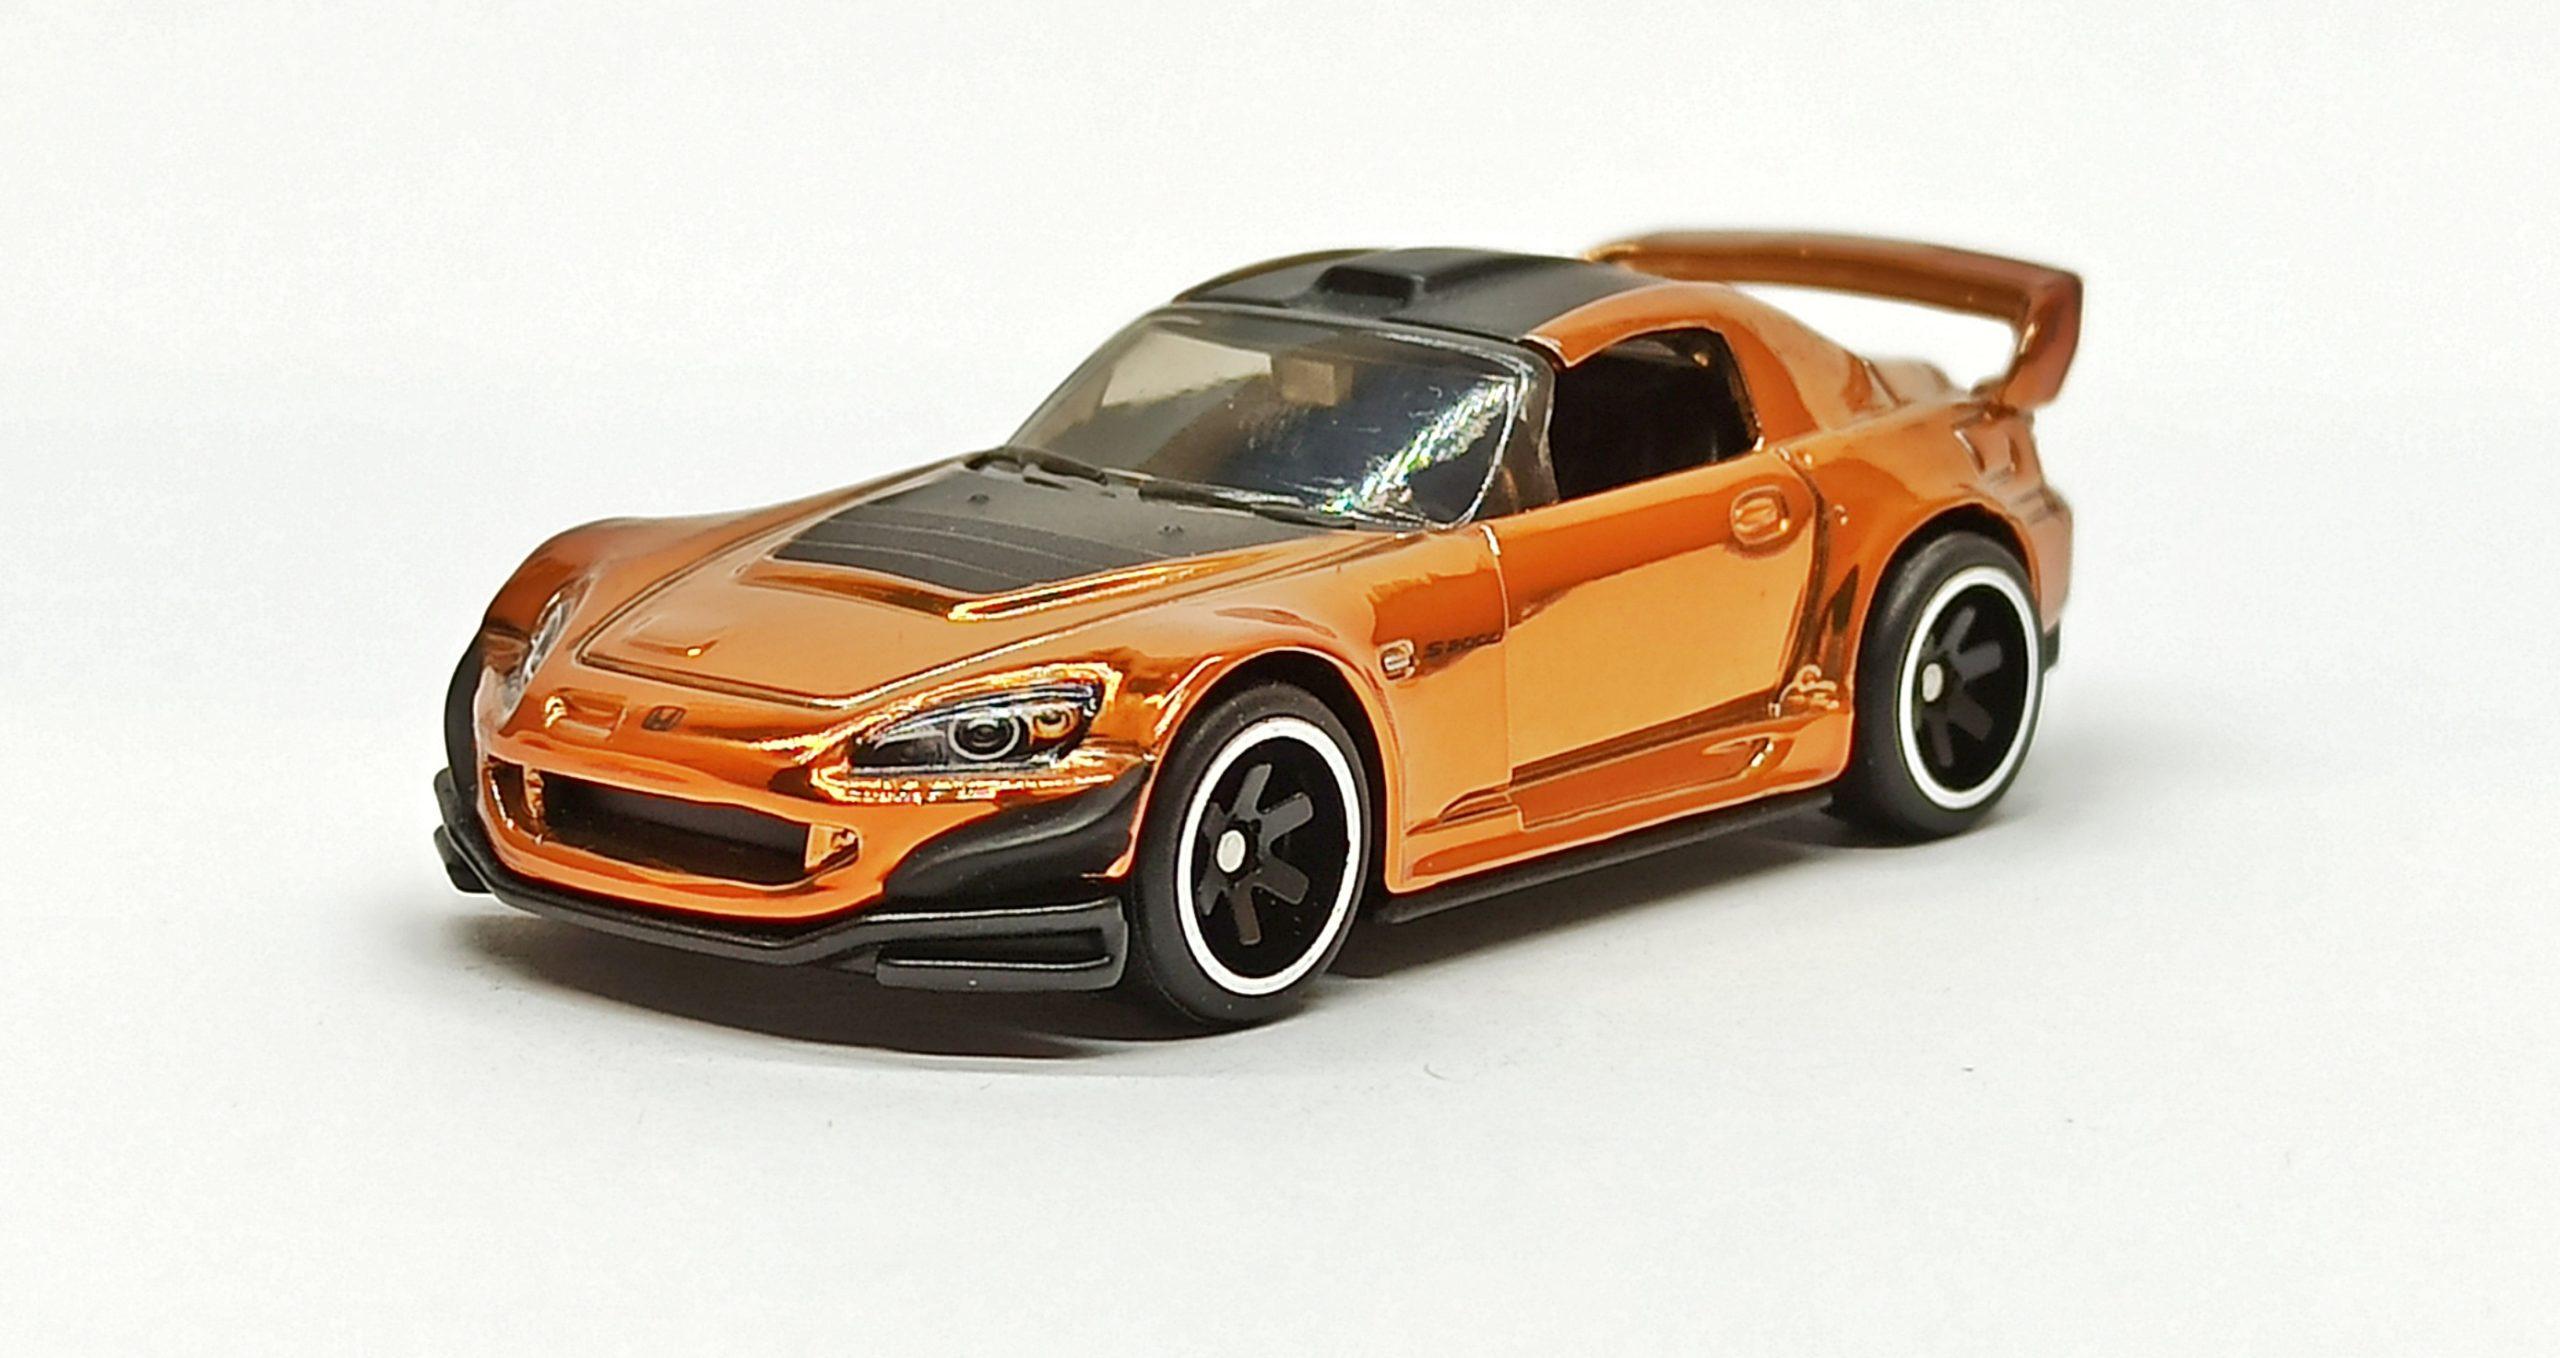 Hot Wheels Honda S2000 2019 RLC Exclusive (1 of 10.000) spectraflame orange side angle